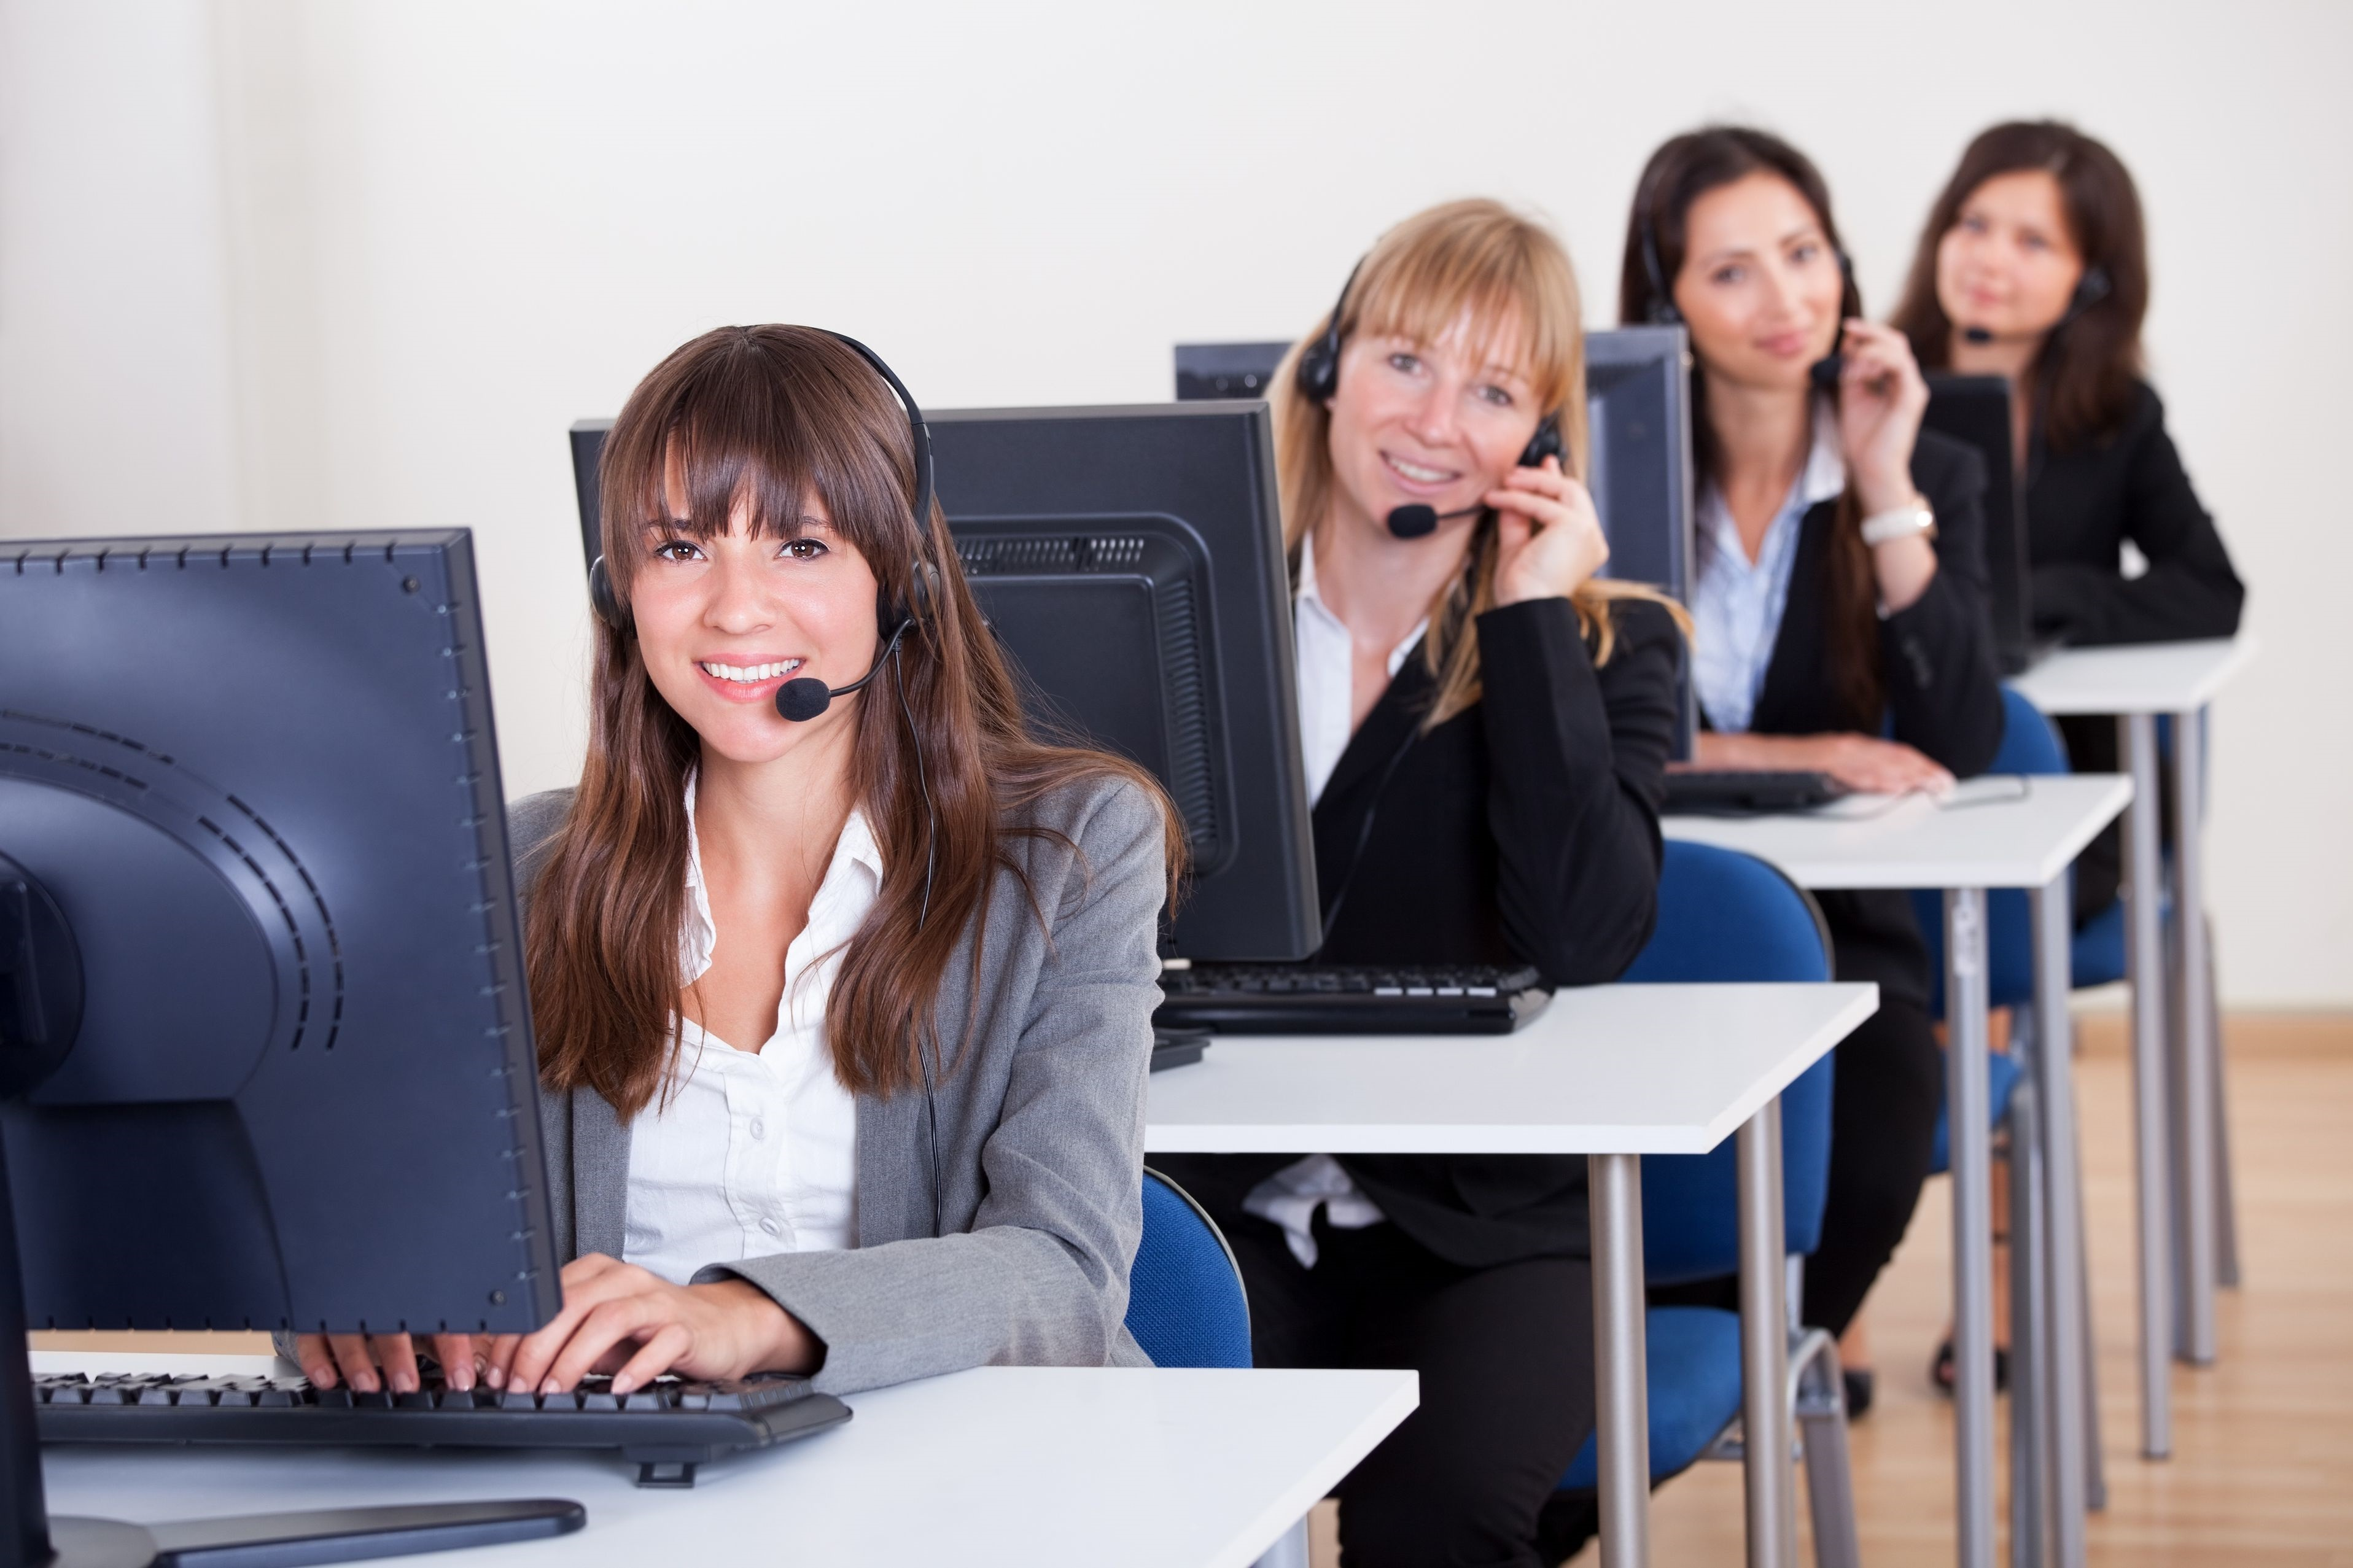 Услуги call центра для интернет-бизнеса